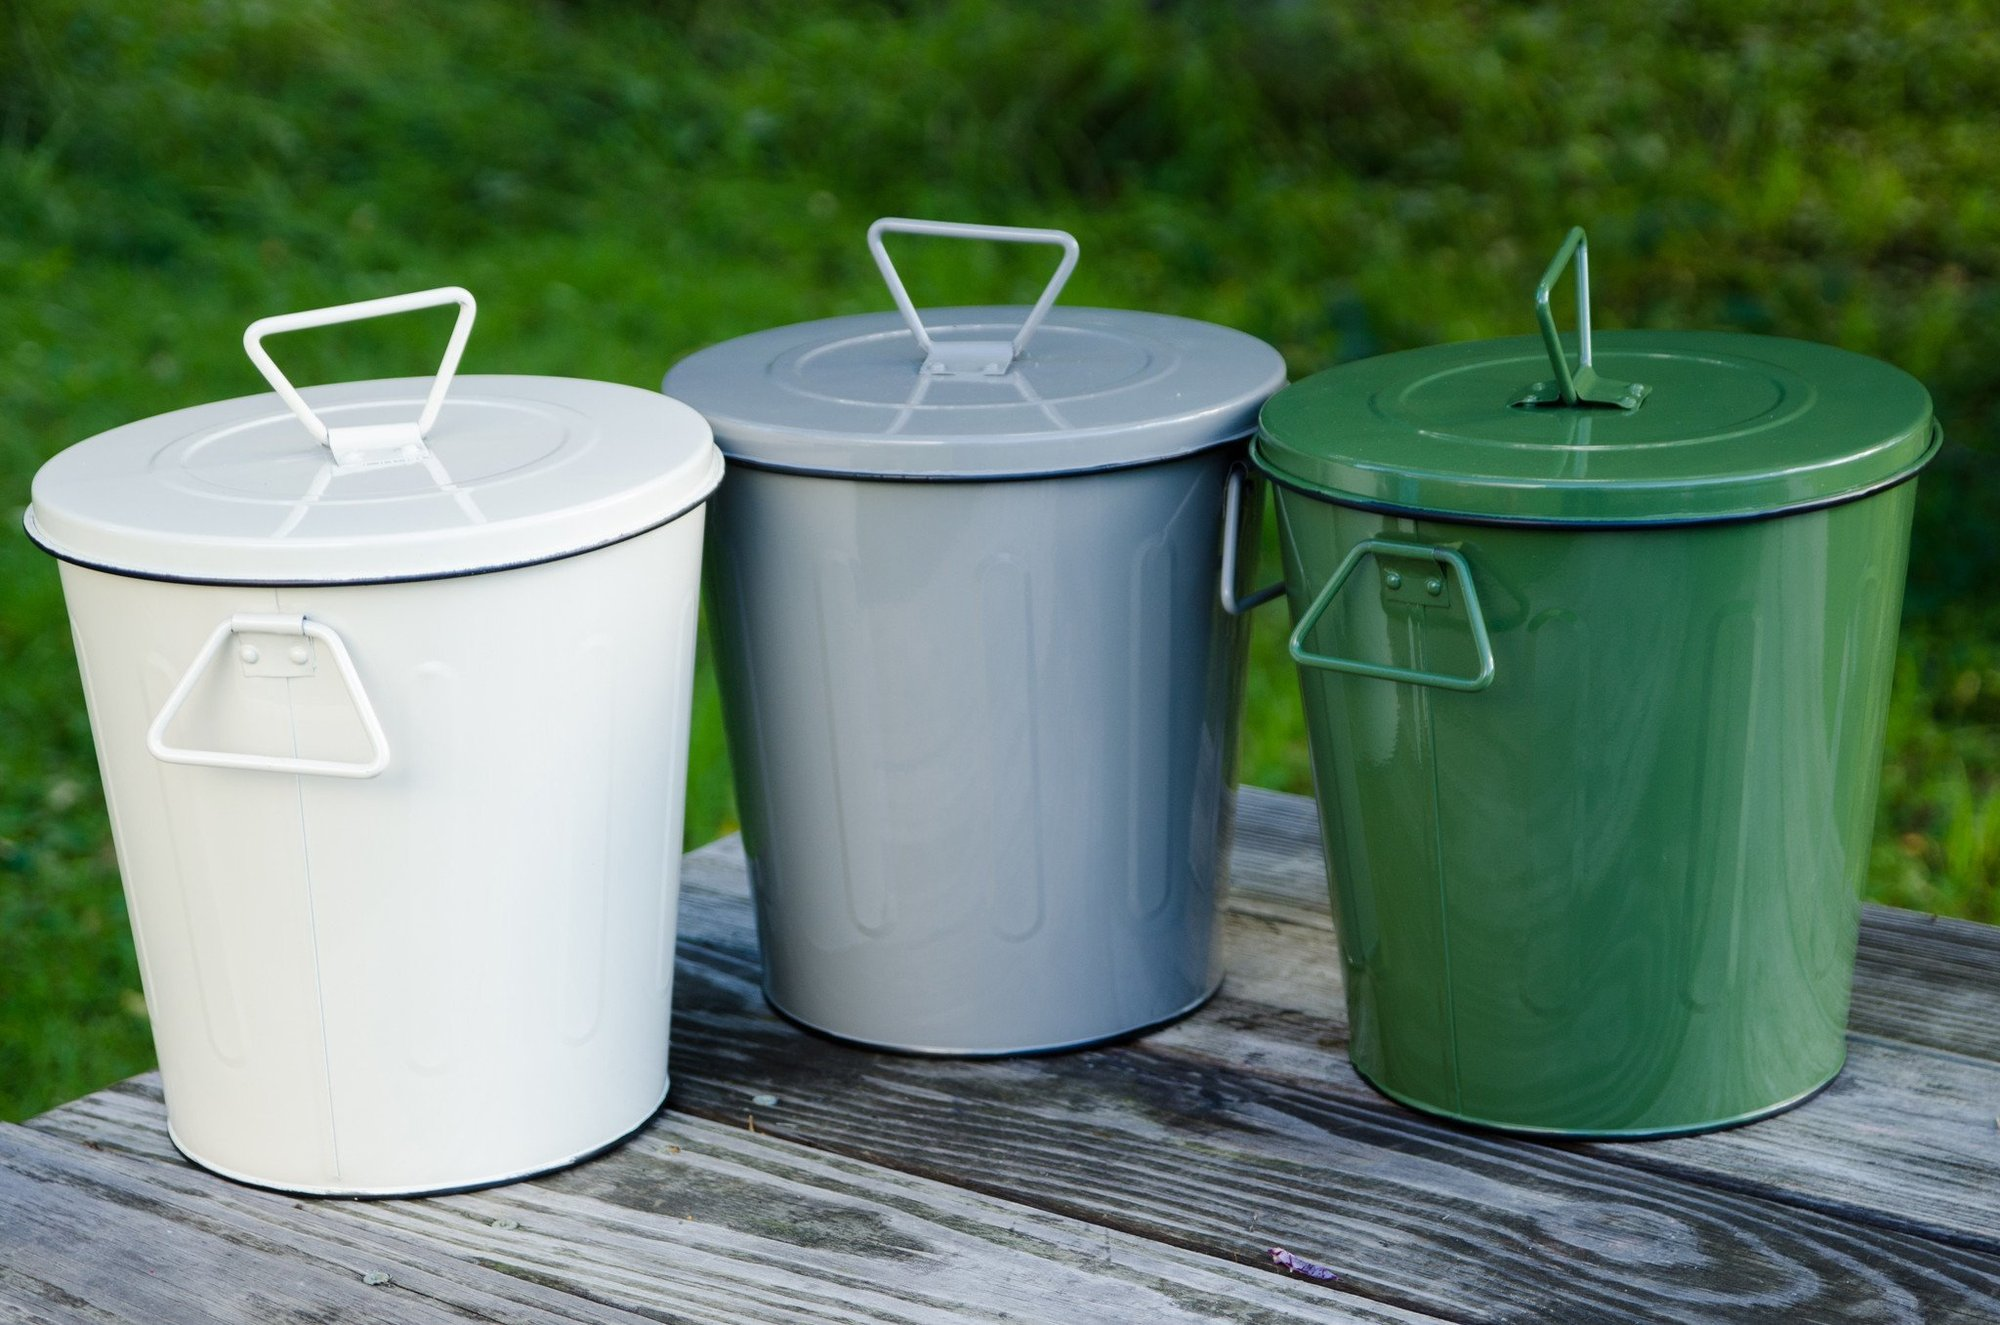 Compost Bins - Metal style